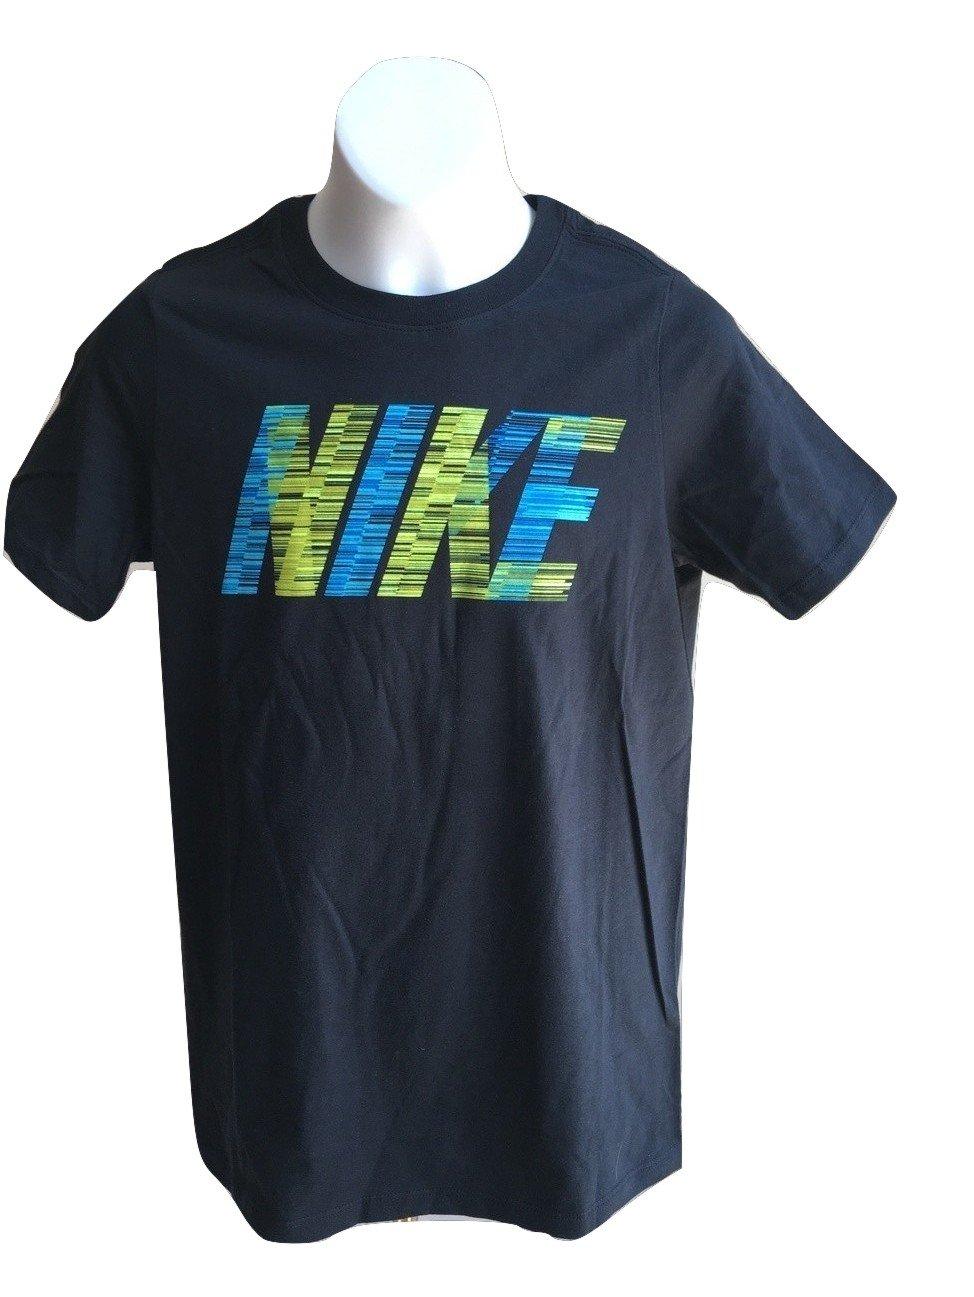 Nike Boy's Graphic Tee T-Shirt AA2122-010 Black